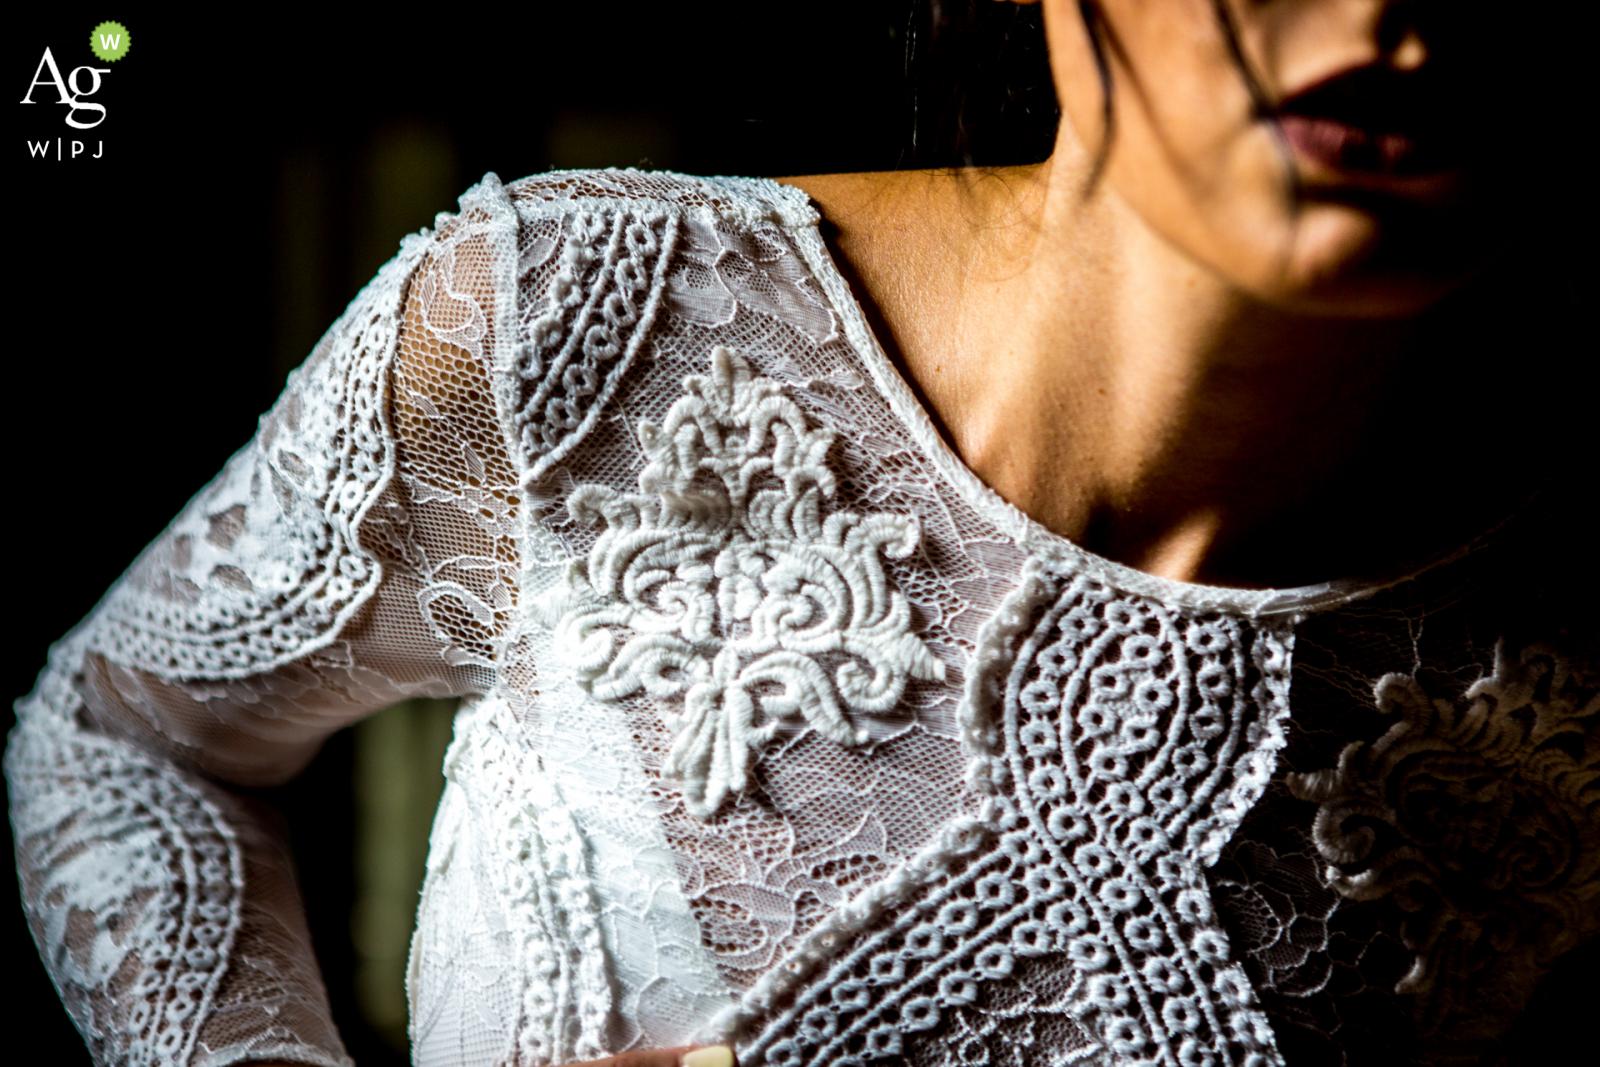 Enrico Celotto is an artistic wedding photographer for Vicenza